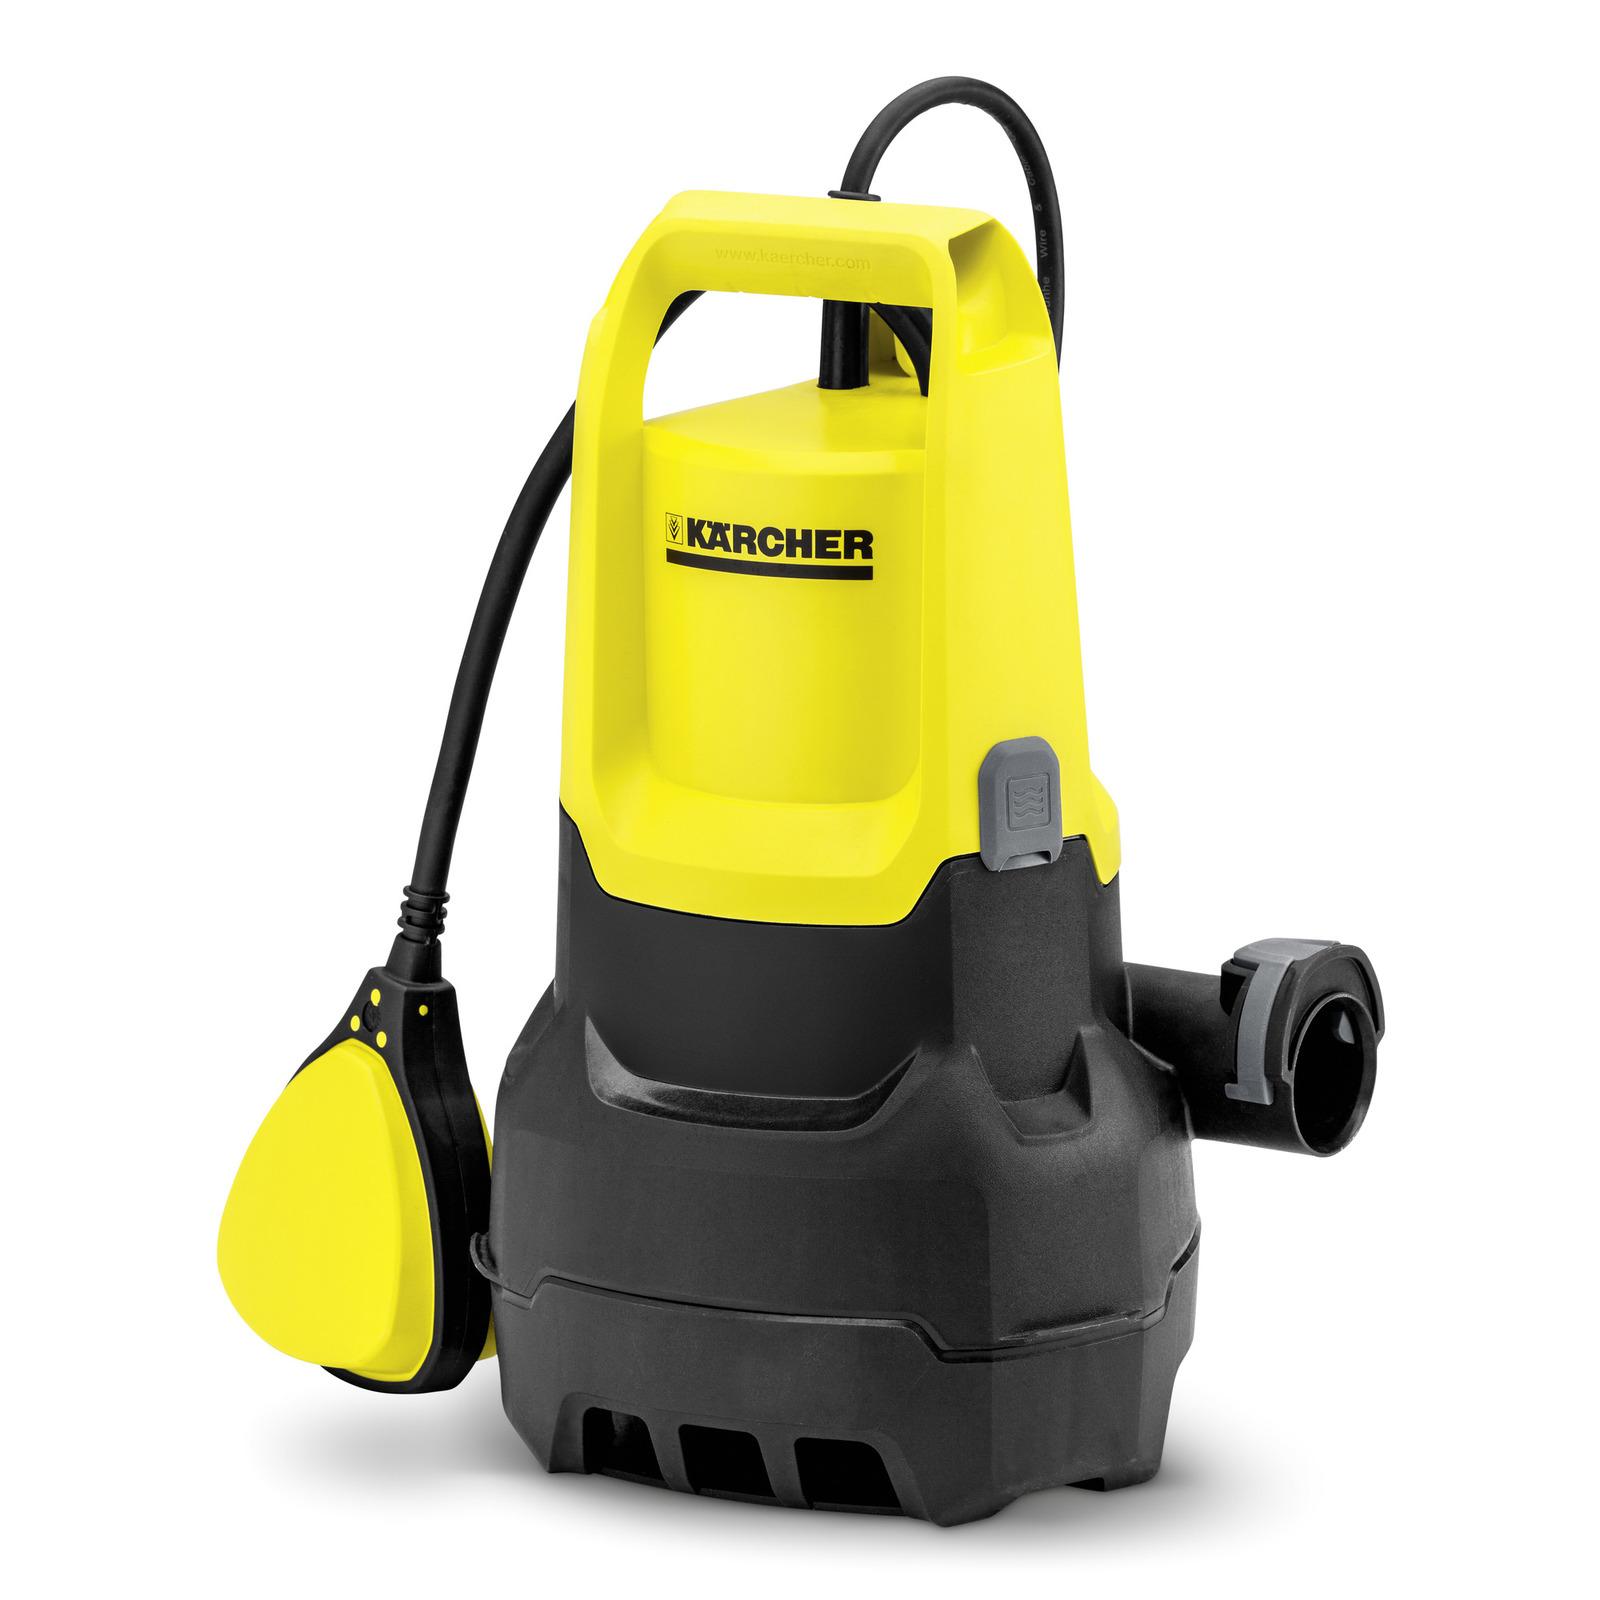 submersible dirty water pump sp 3 dirt k rcher uk. Black Bedroom Furniture Sets. Home Design Ideas